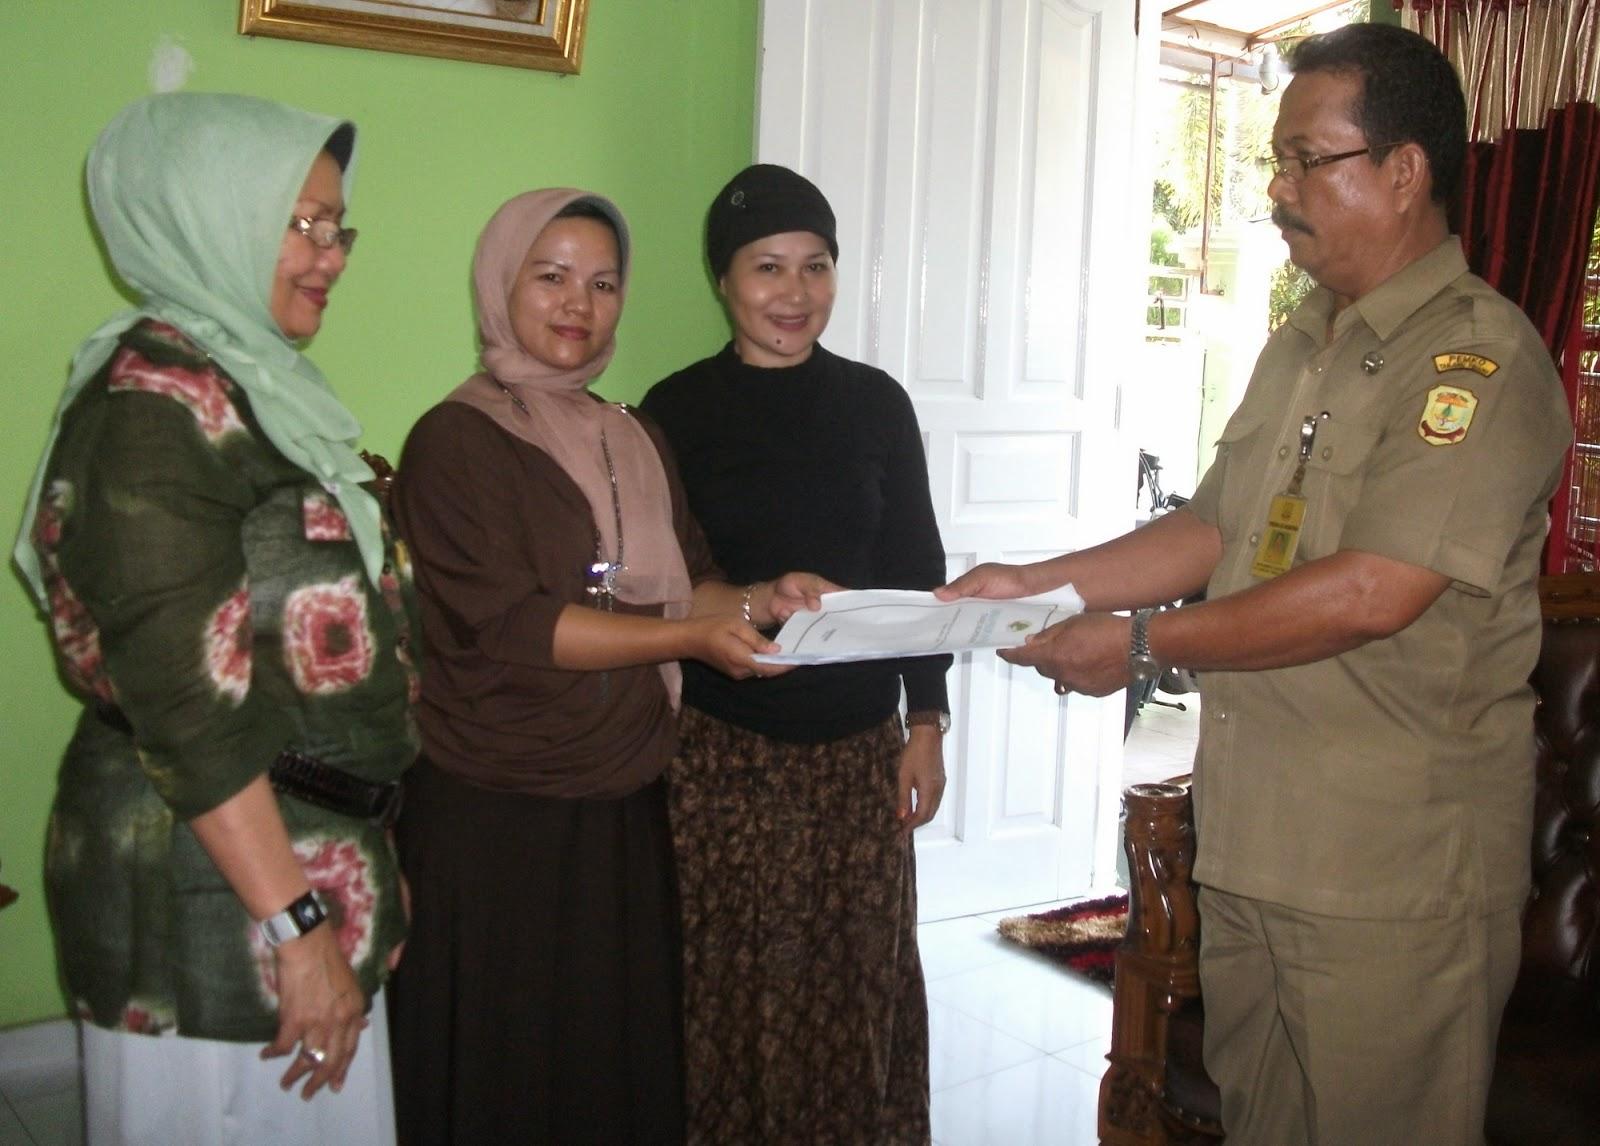 ketua koperasi wanita perempuan peduli kota tanjungpinang ruziana mendapatkan penghargaan